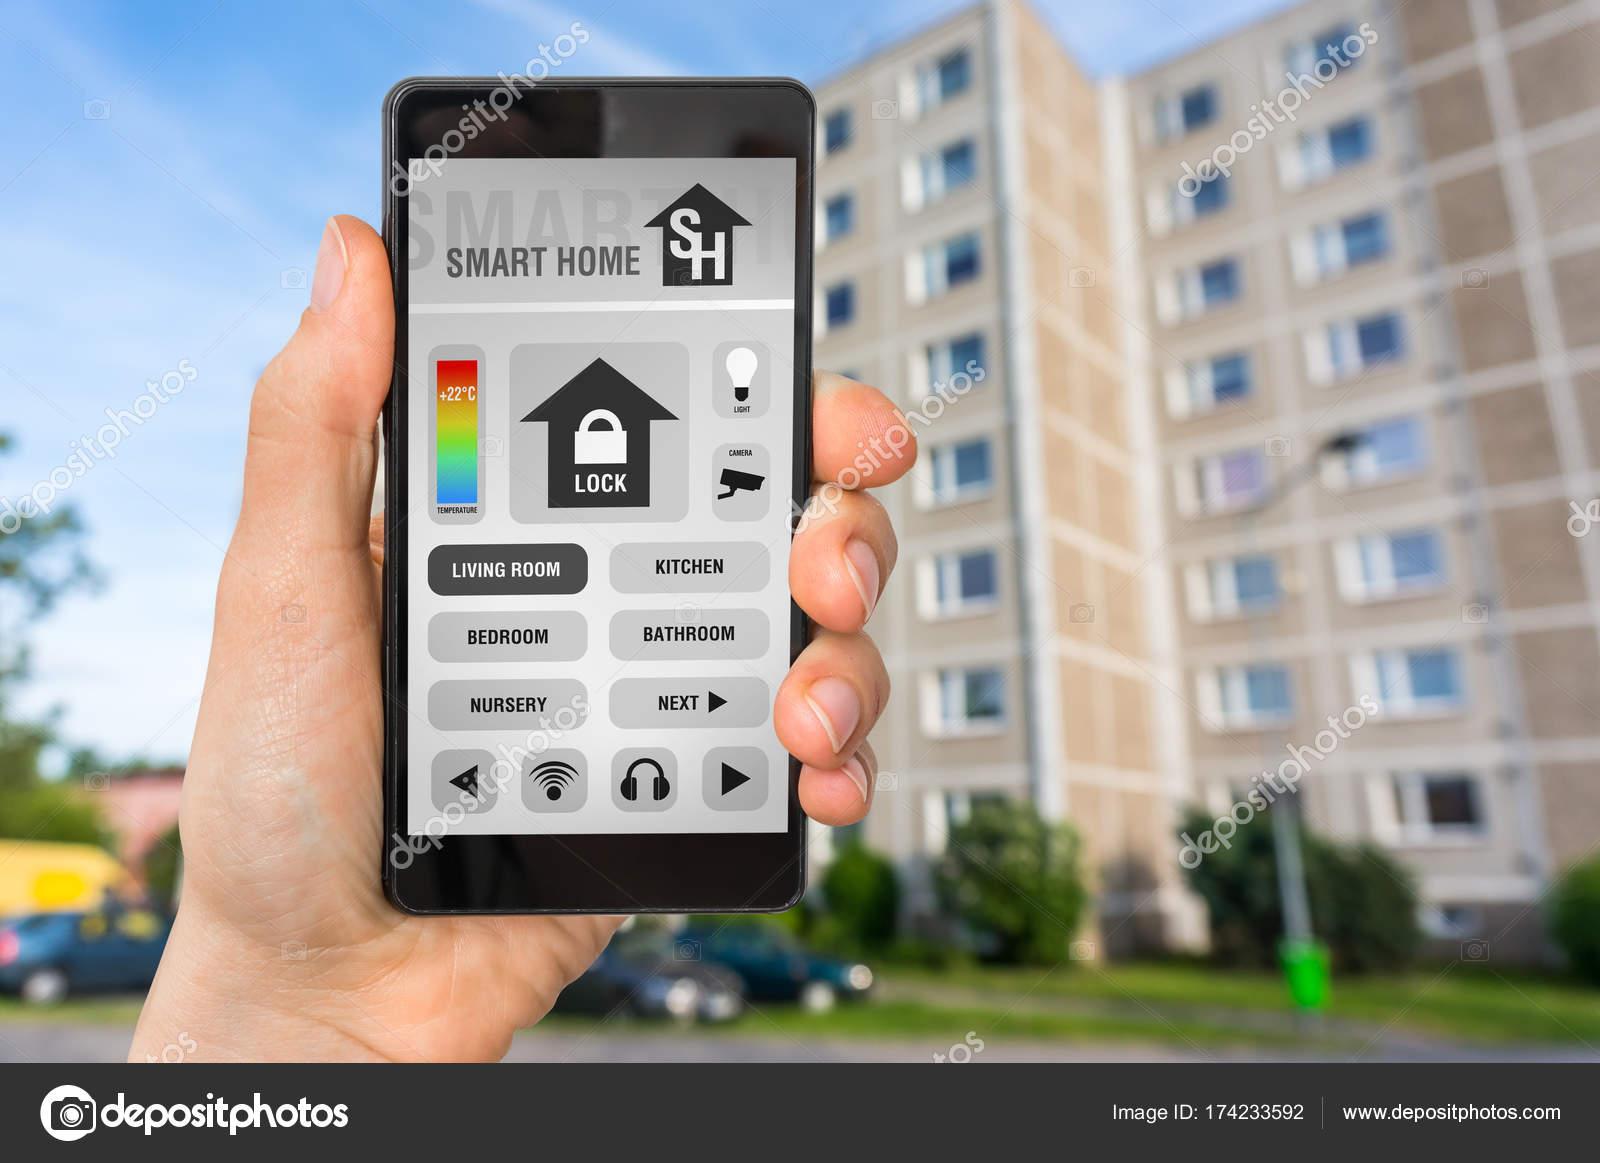 Smart home control app on smartphone - smart home concept